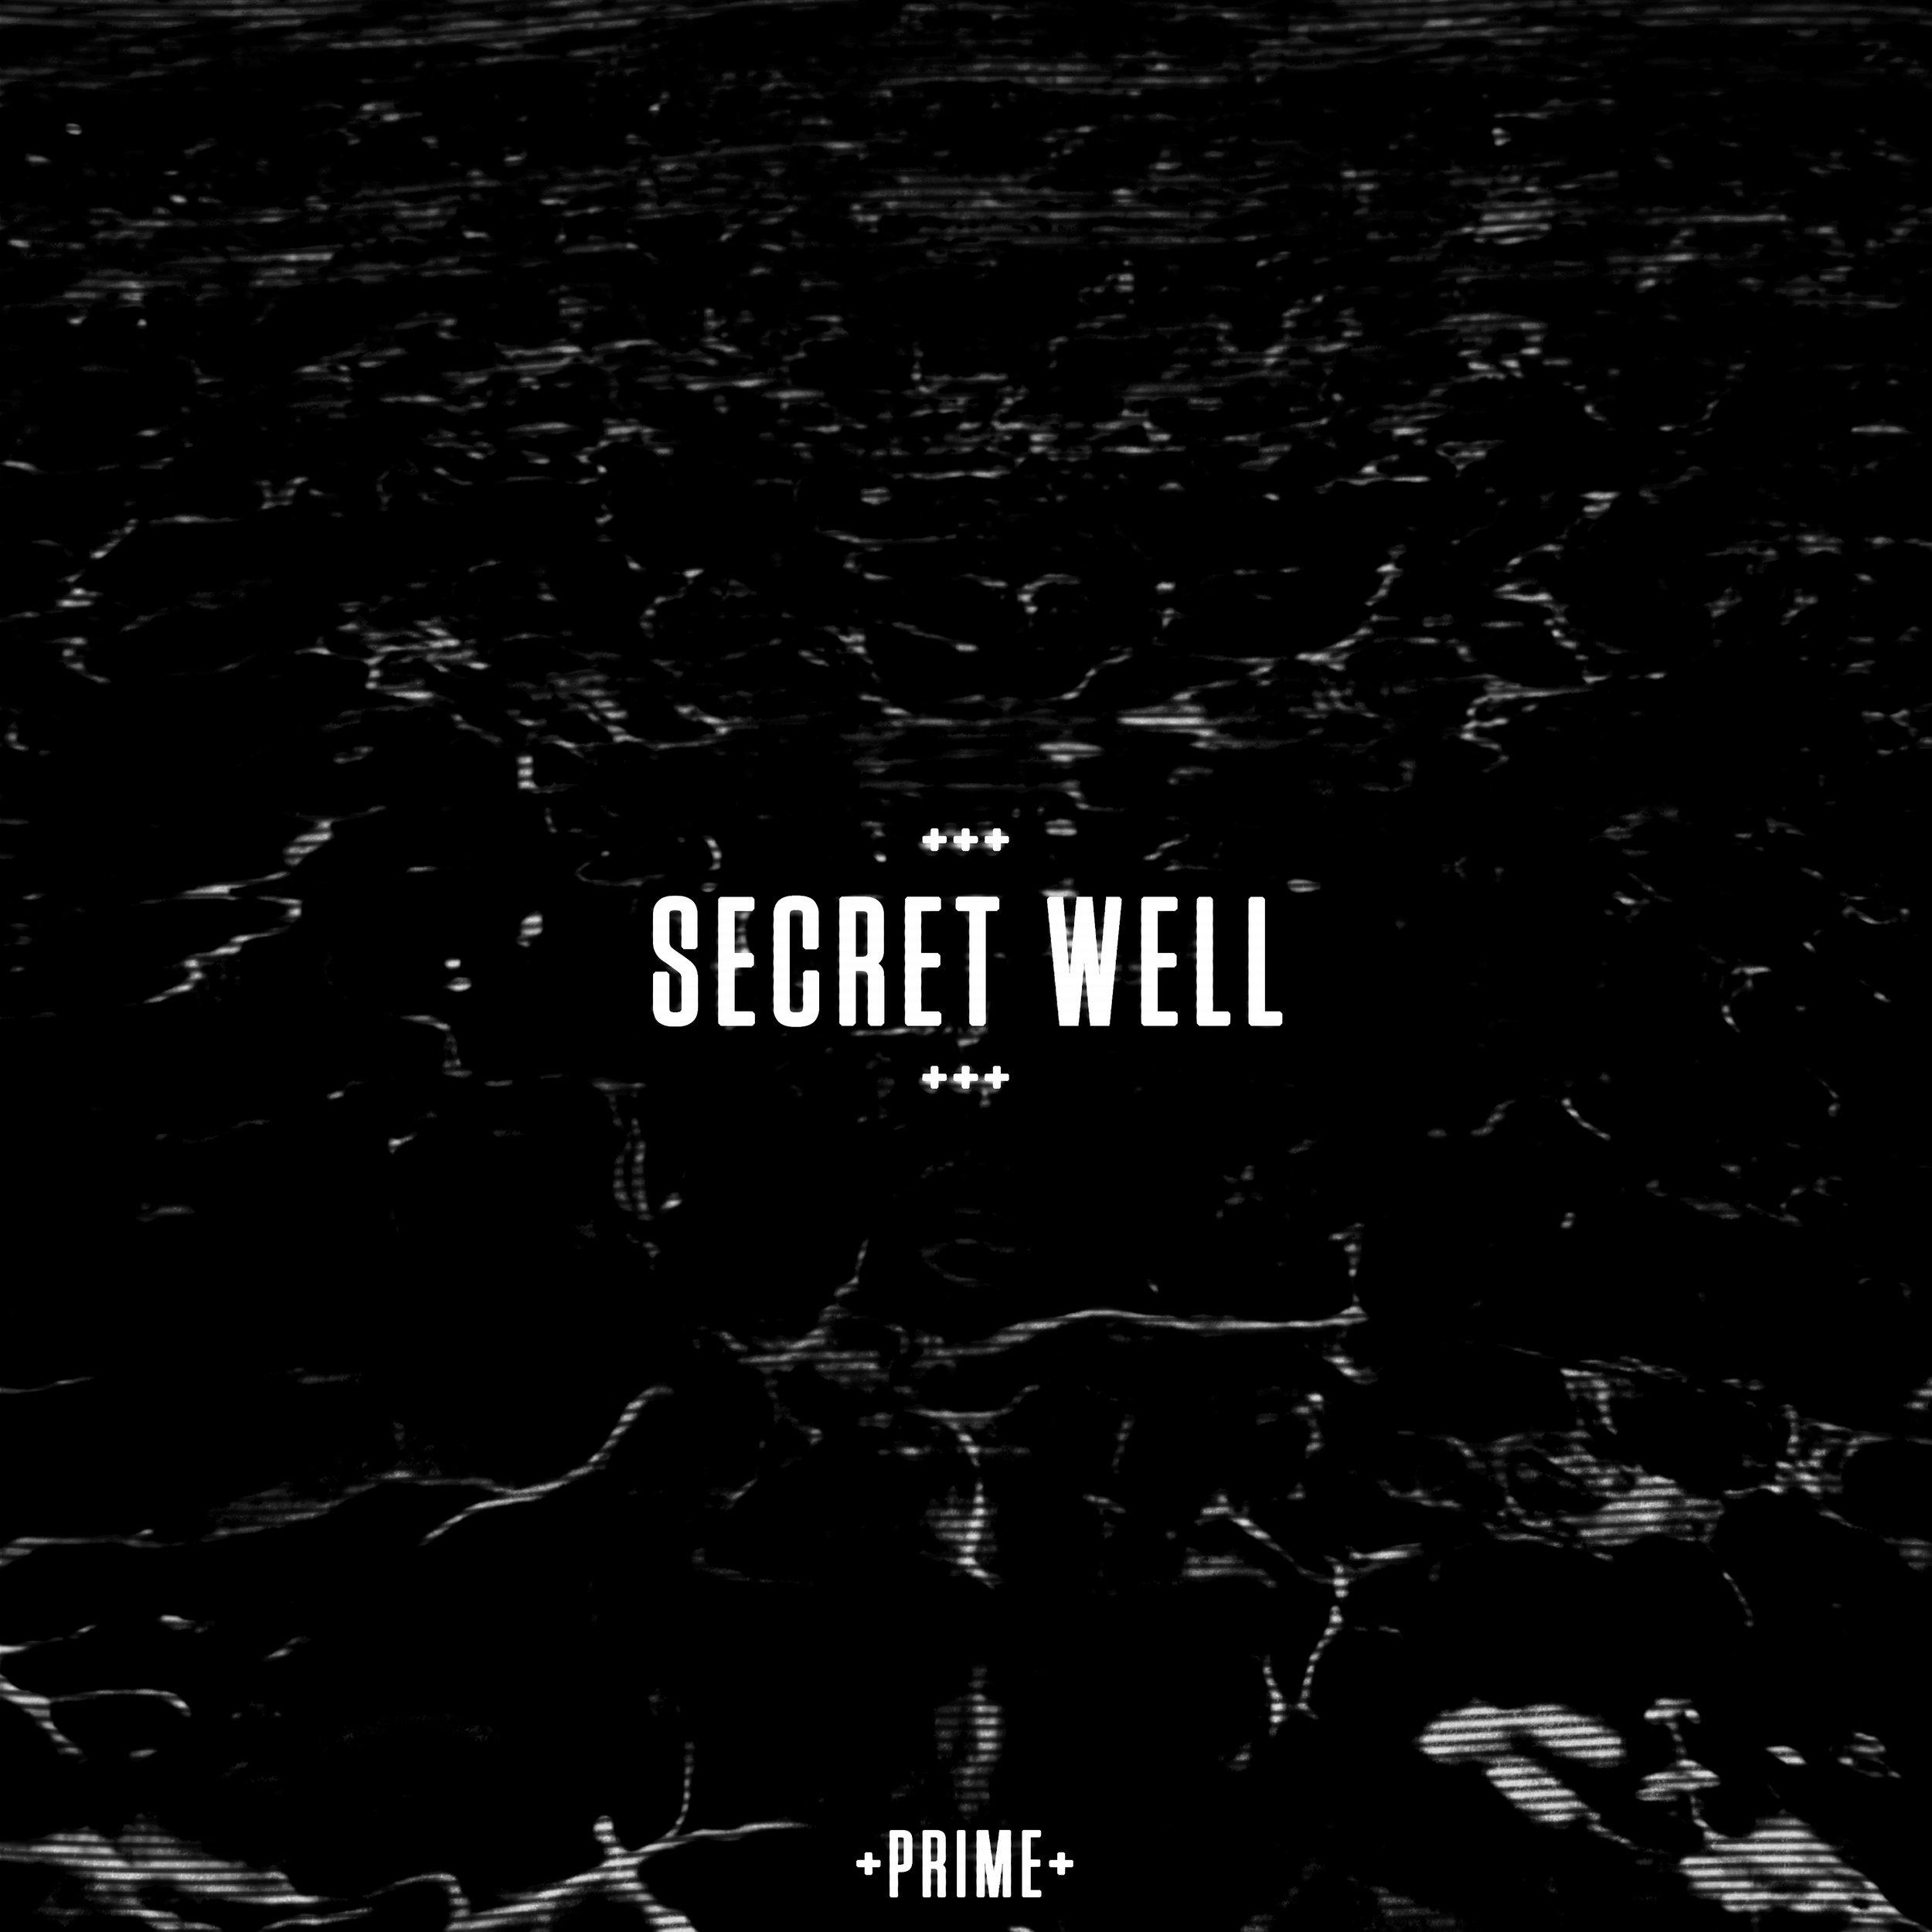 secret-well-art.jpg